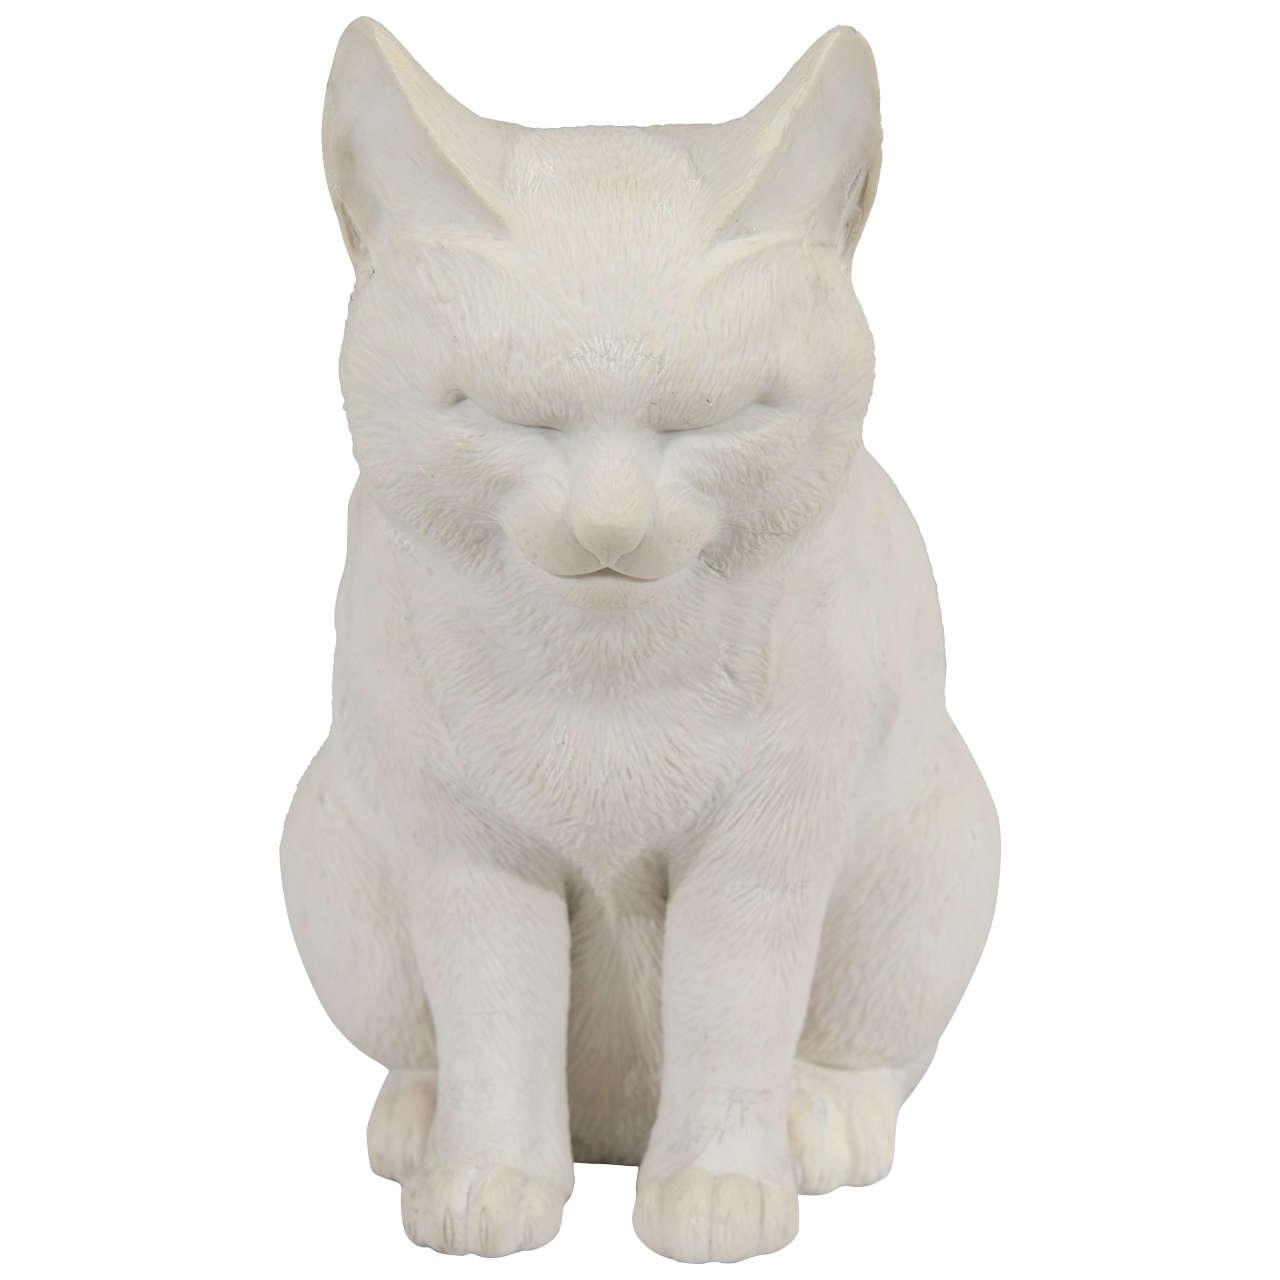 19th Century Japanese Hirado Porcelain Cat Sculpture